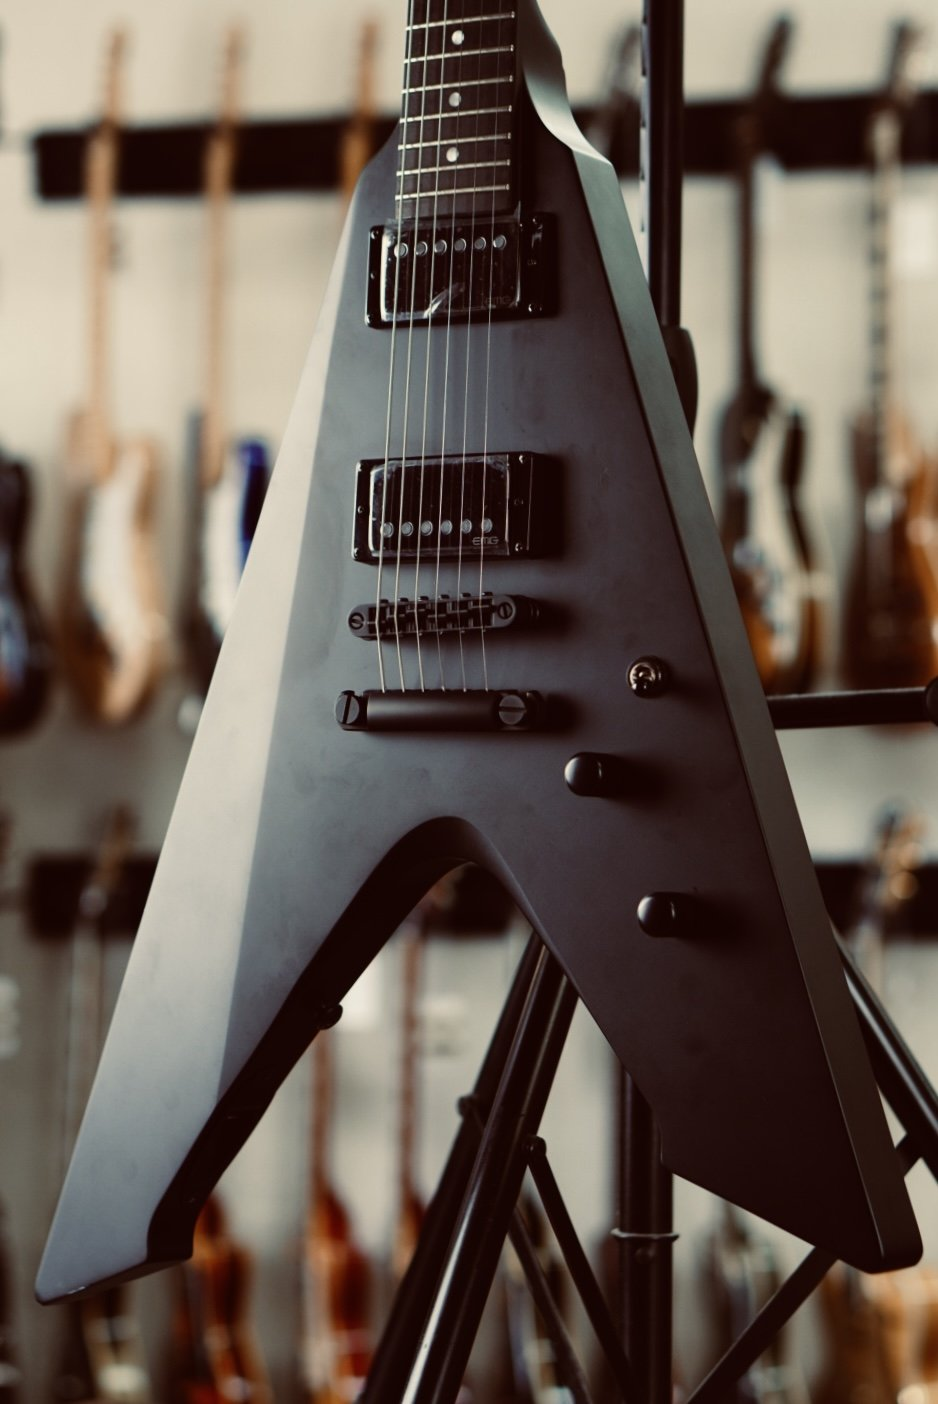 2016 ESP LTD Vulture James Hetfield Signature Series Black Satin